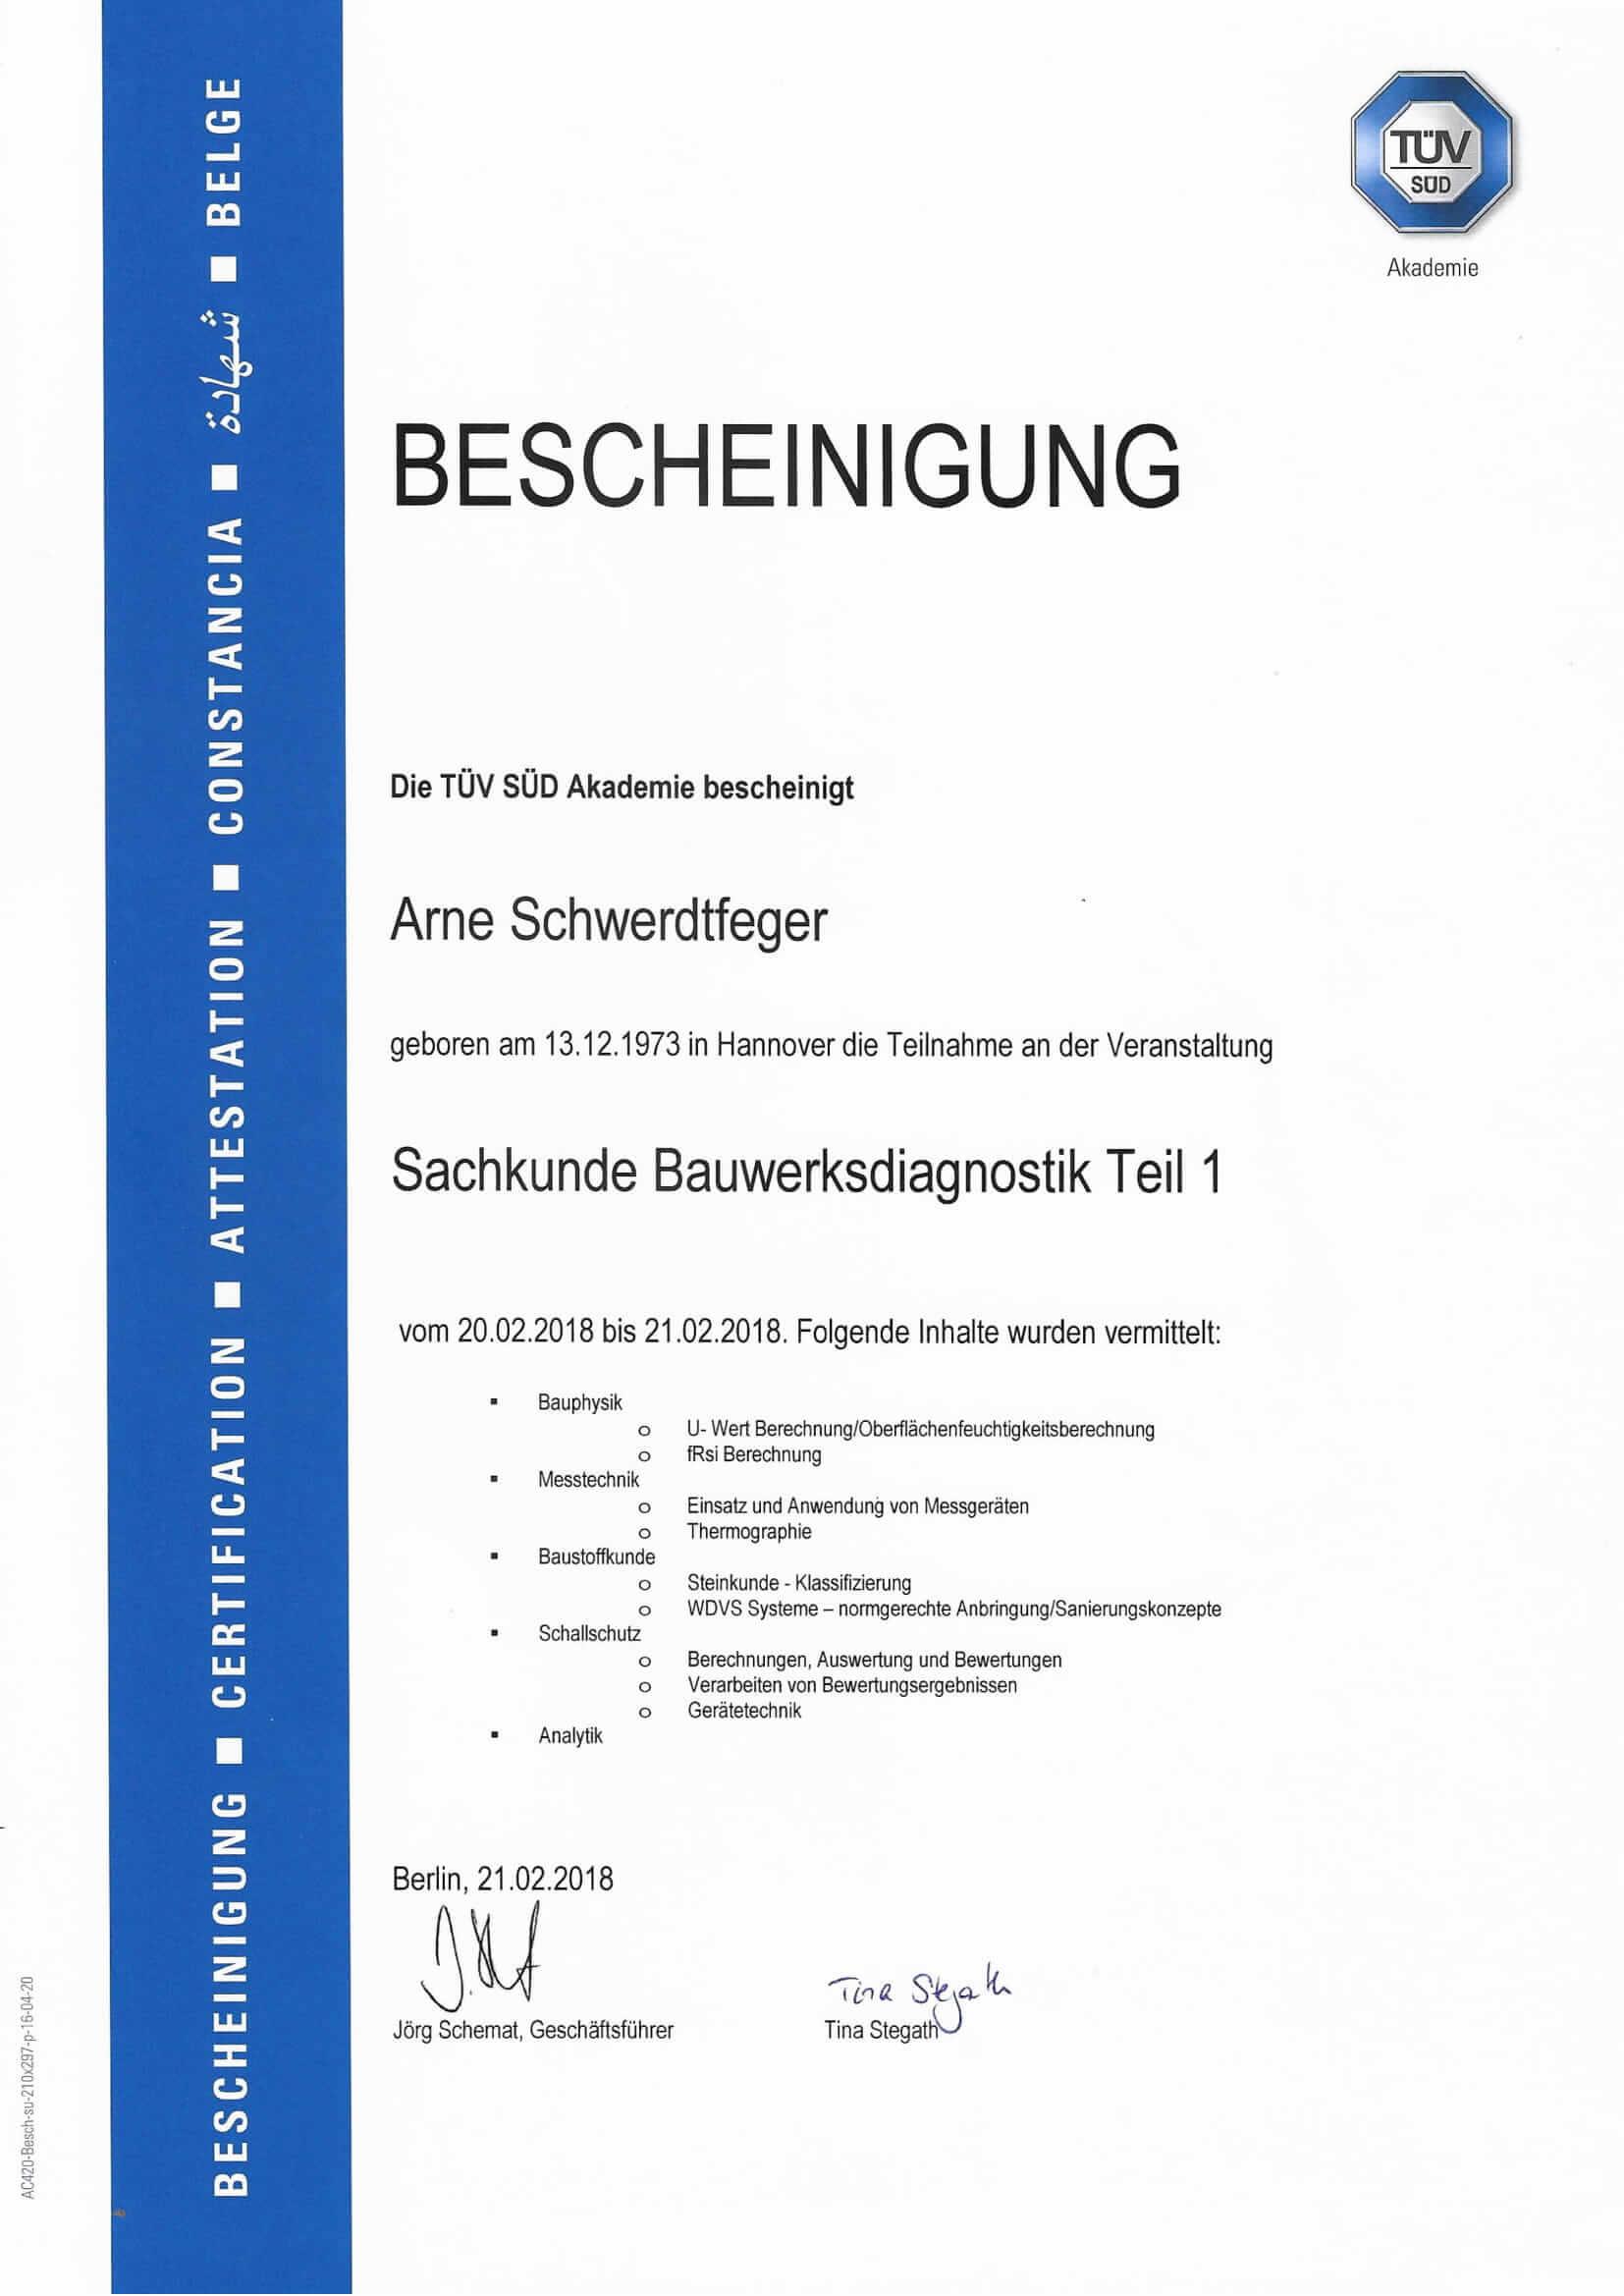 Sachkunde Bauwerksdiagnostik Zertifikat